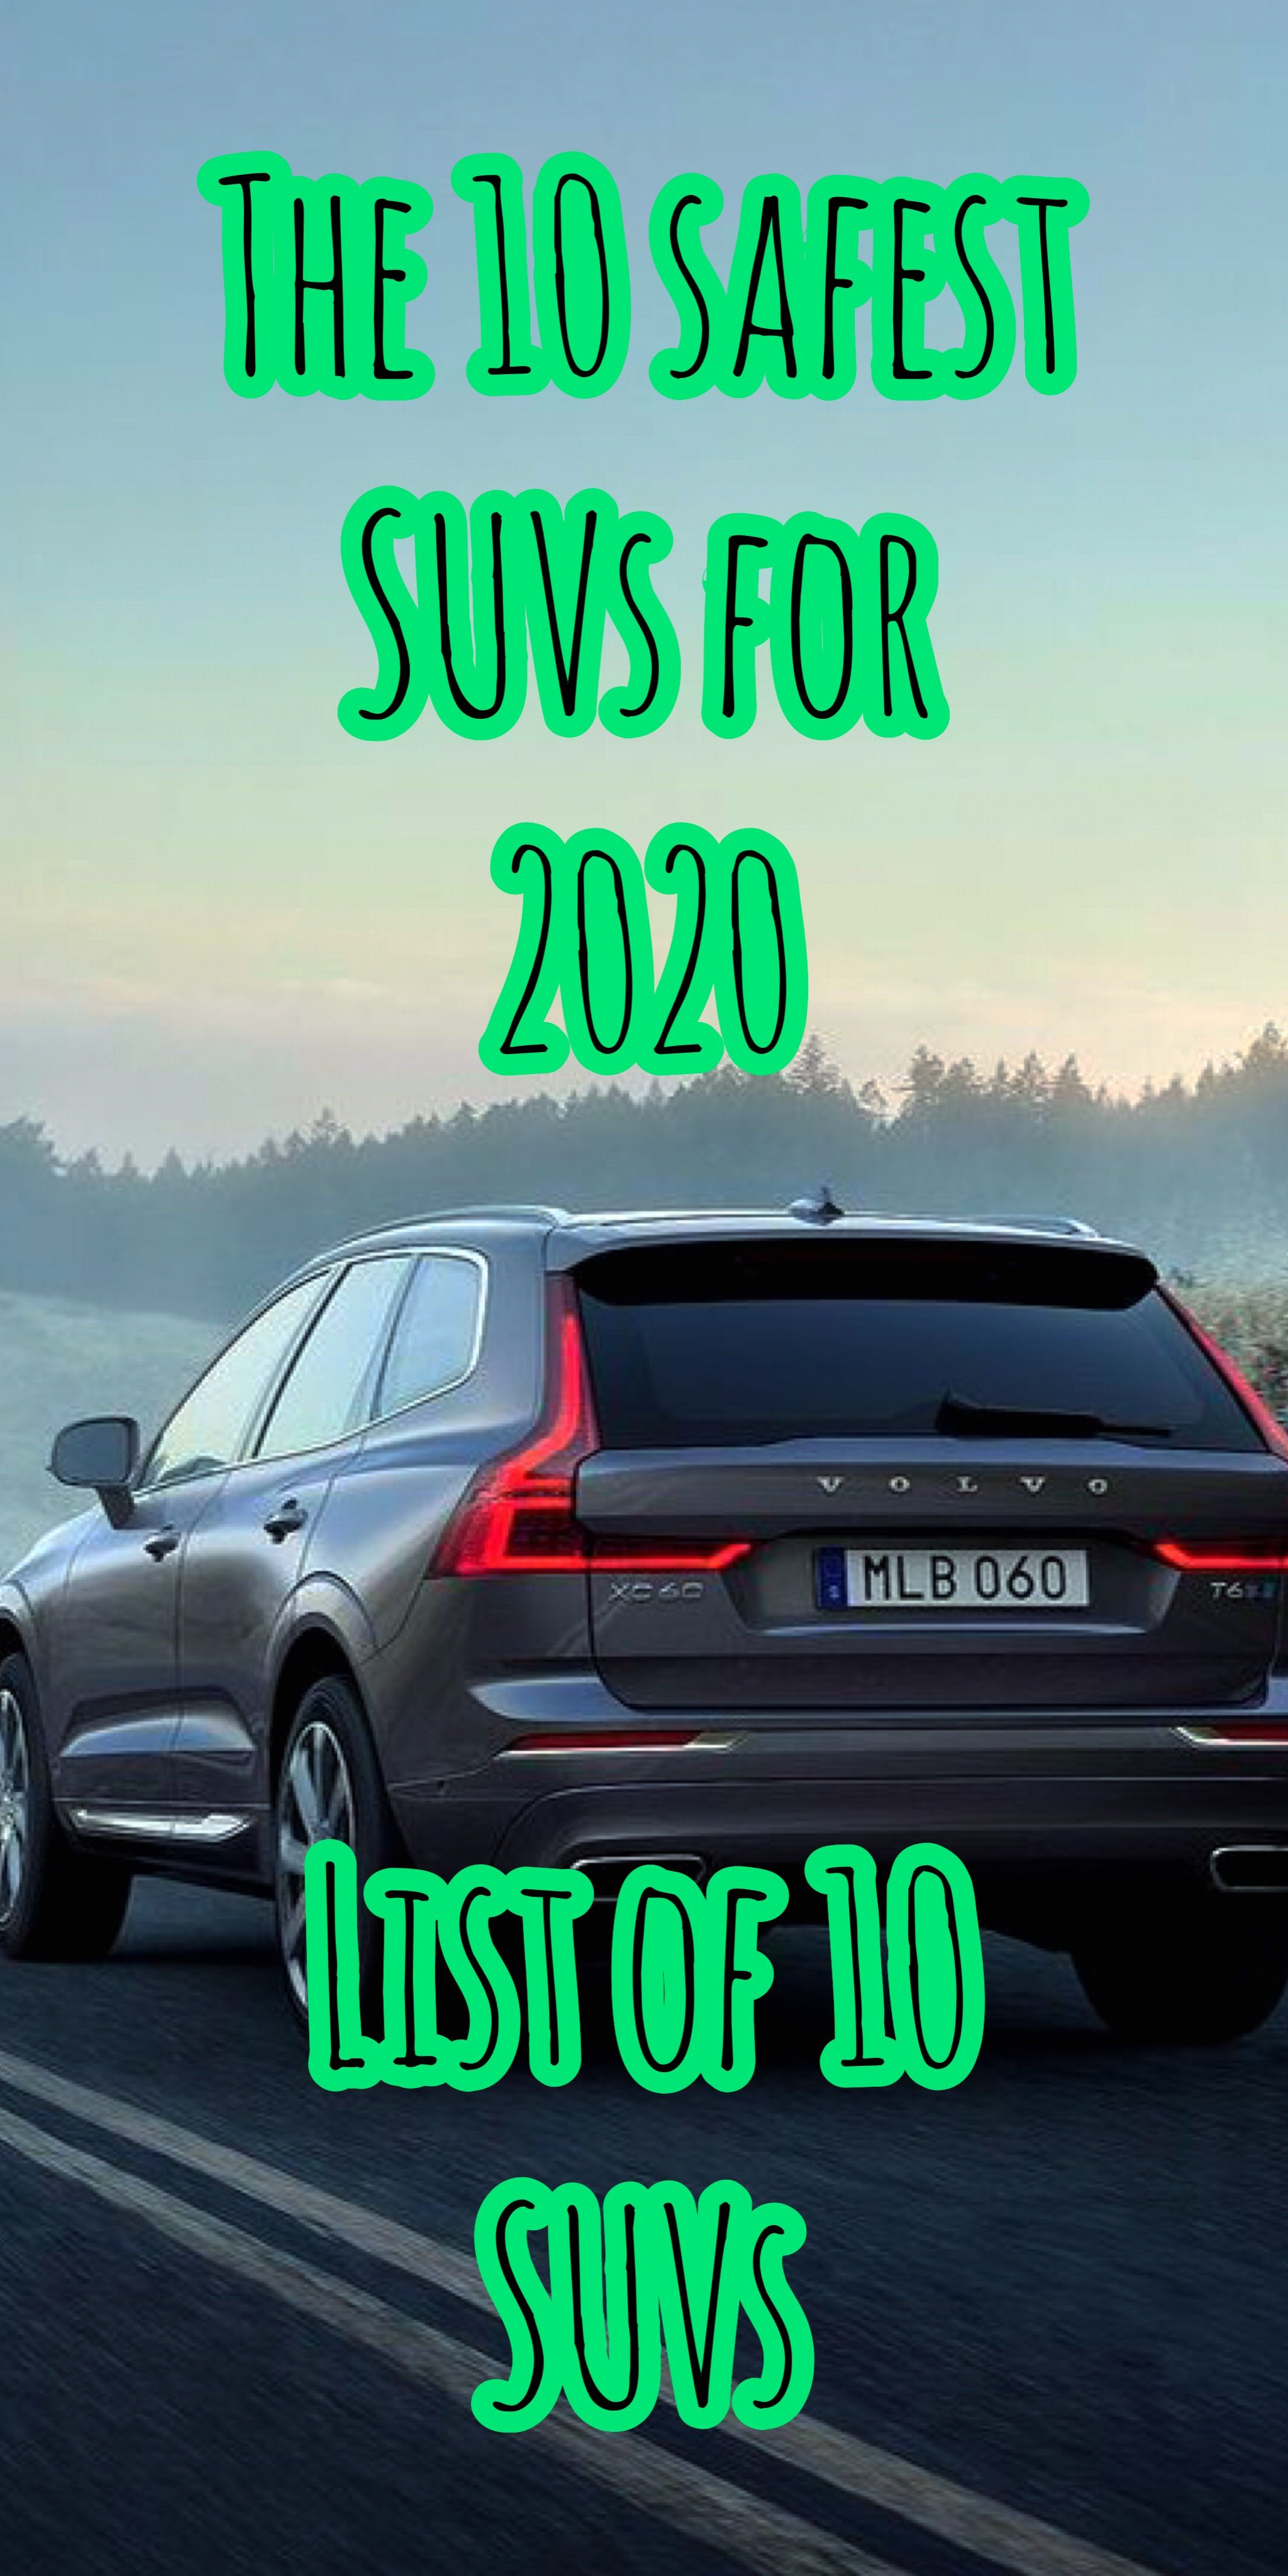 The 10 Safest Suvs You Can Buy It Now 2020 In 2020 Safest Suv Hybrid Car Safe Cars